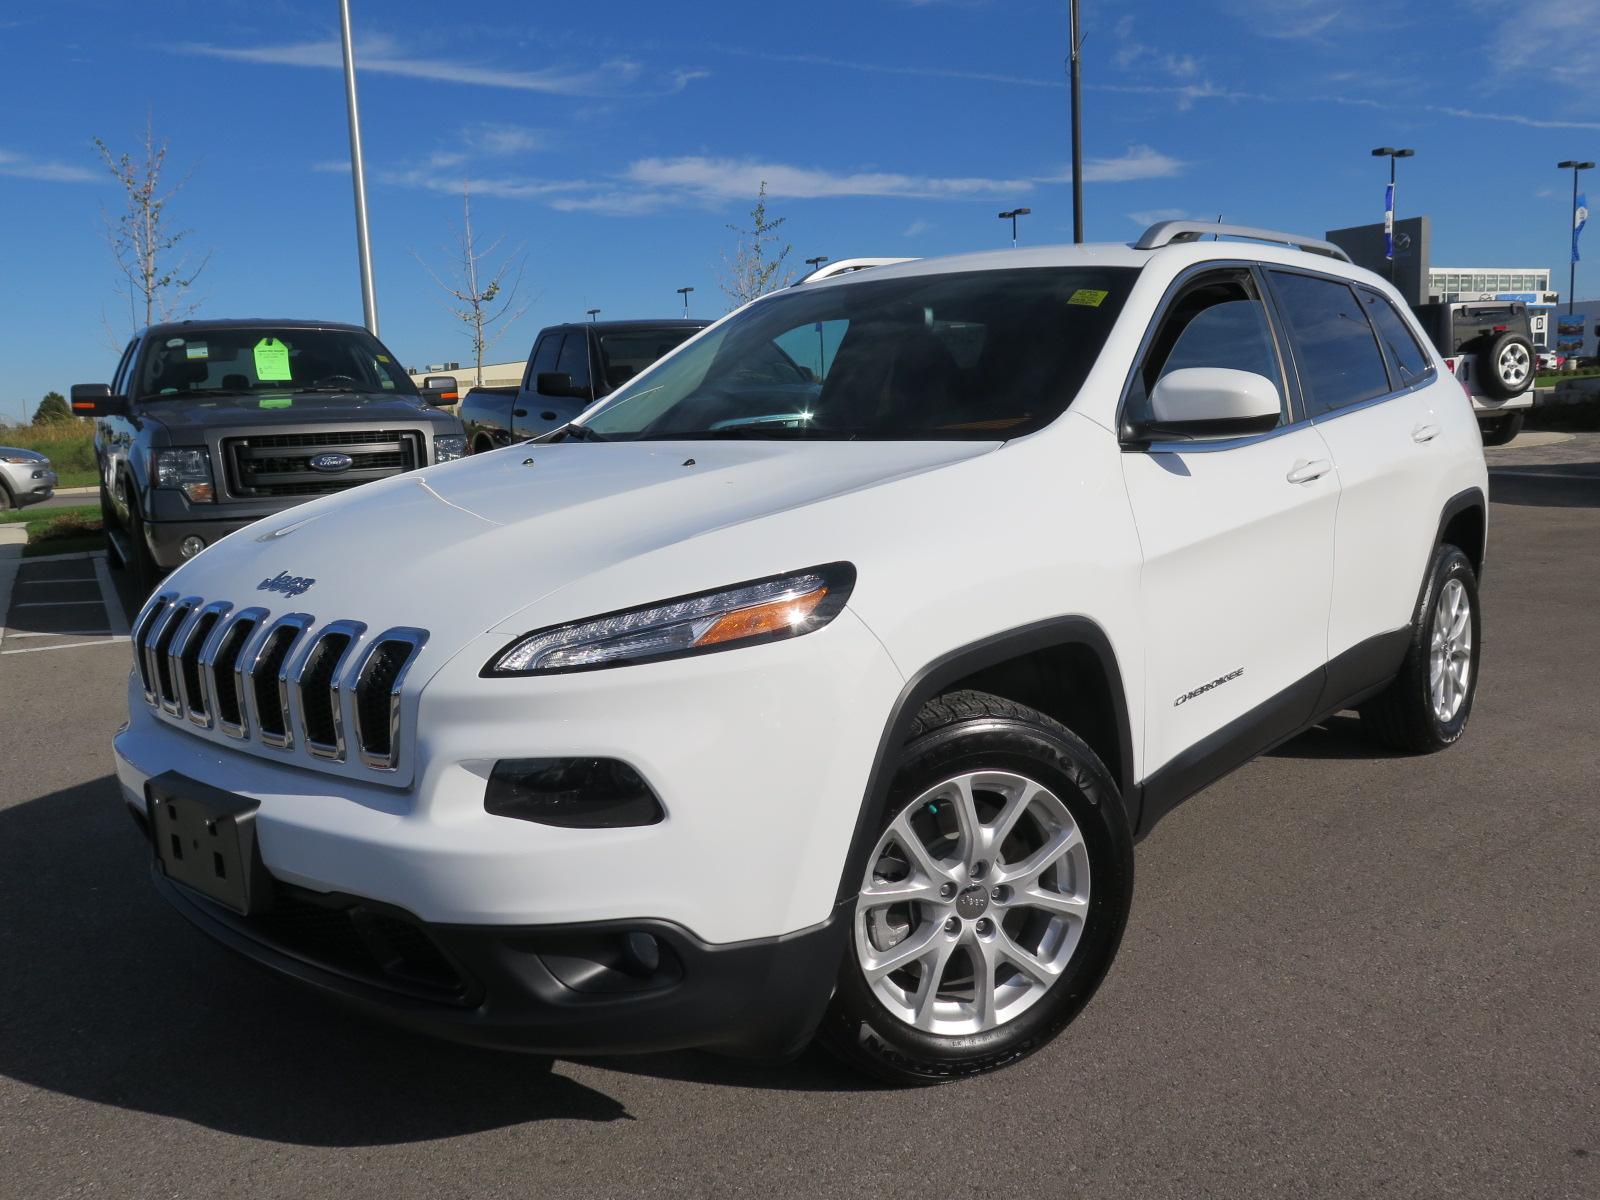 New 2015 Jeep Cherokee, $25733